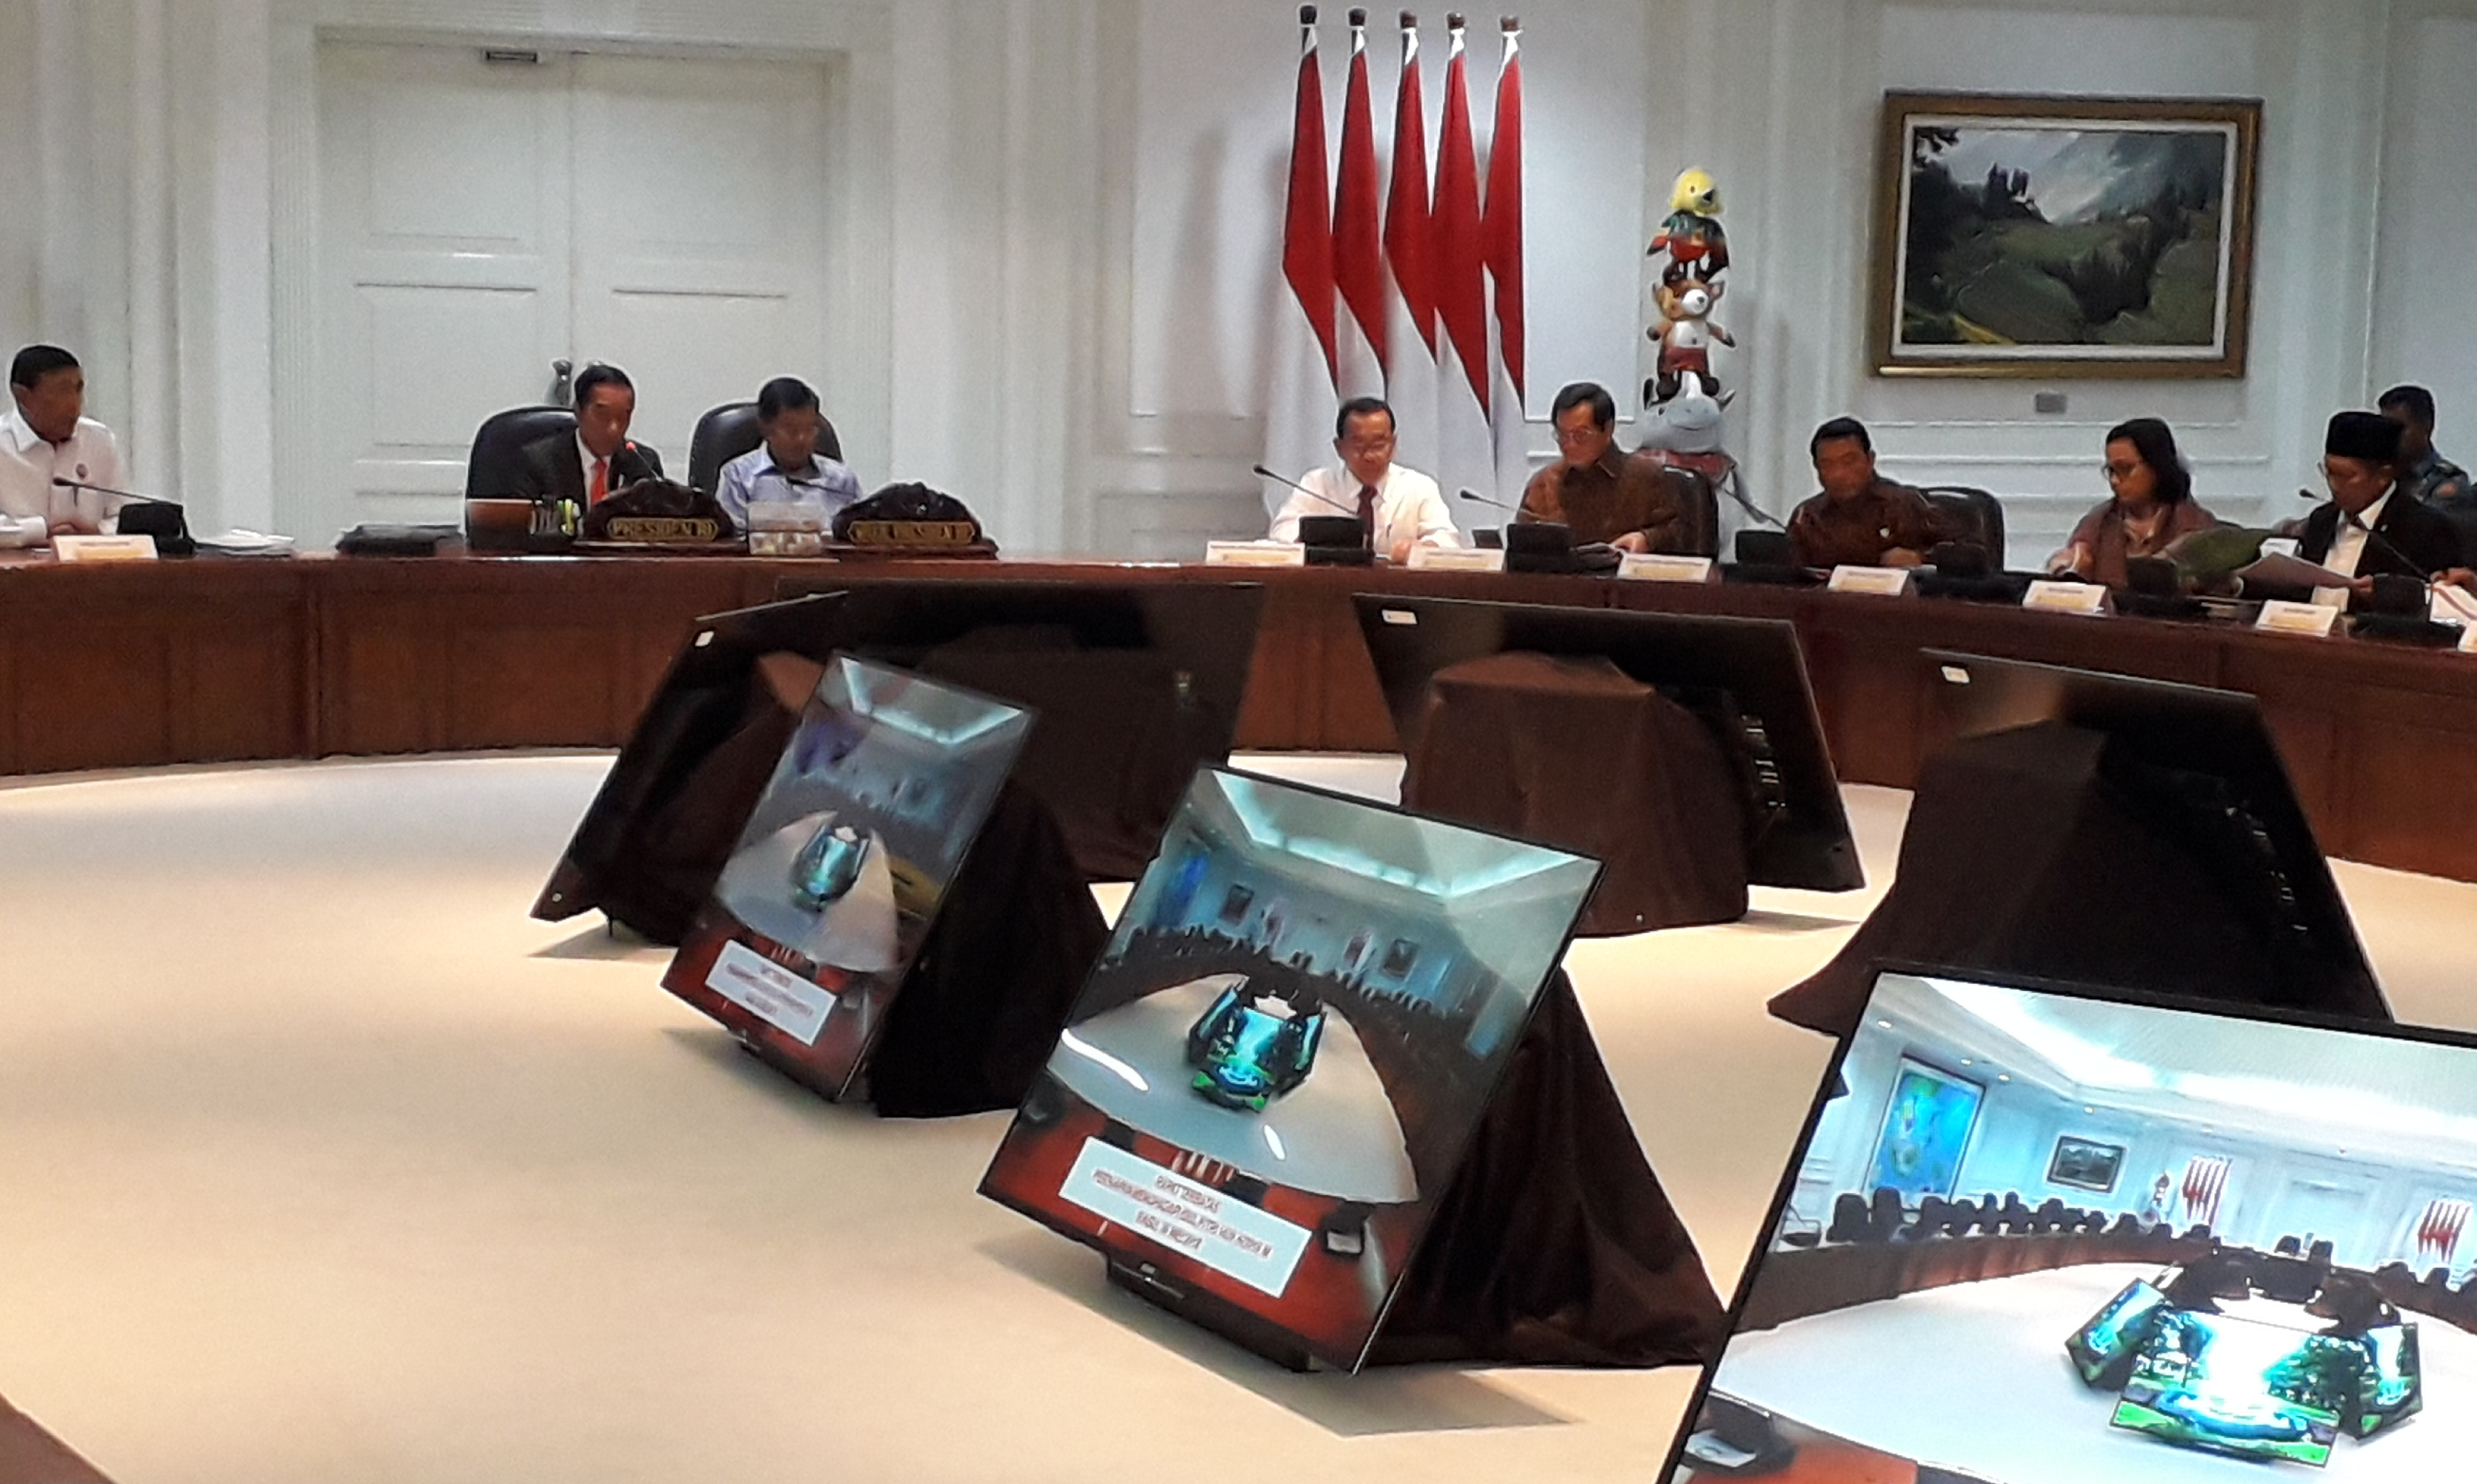 Presiden Jokowi Yakin Sinergi Polri, TNI, dan BIN Mampu Tangkal Gangguan Keamanan Idulfitri 1439H